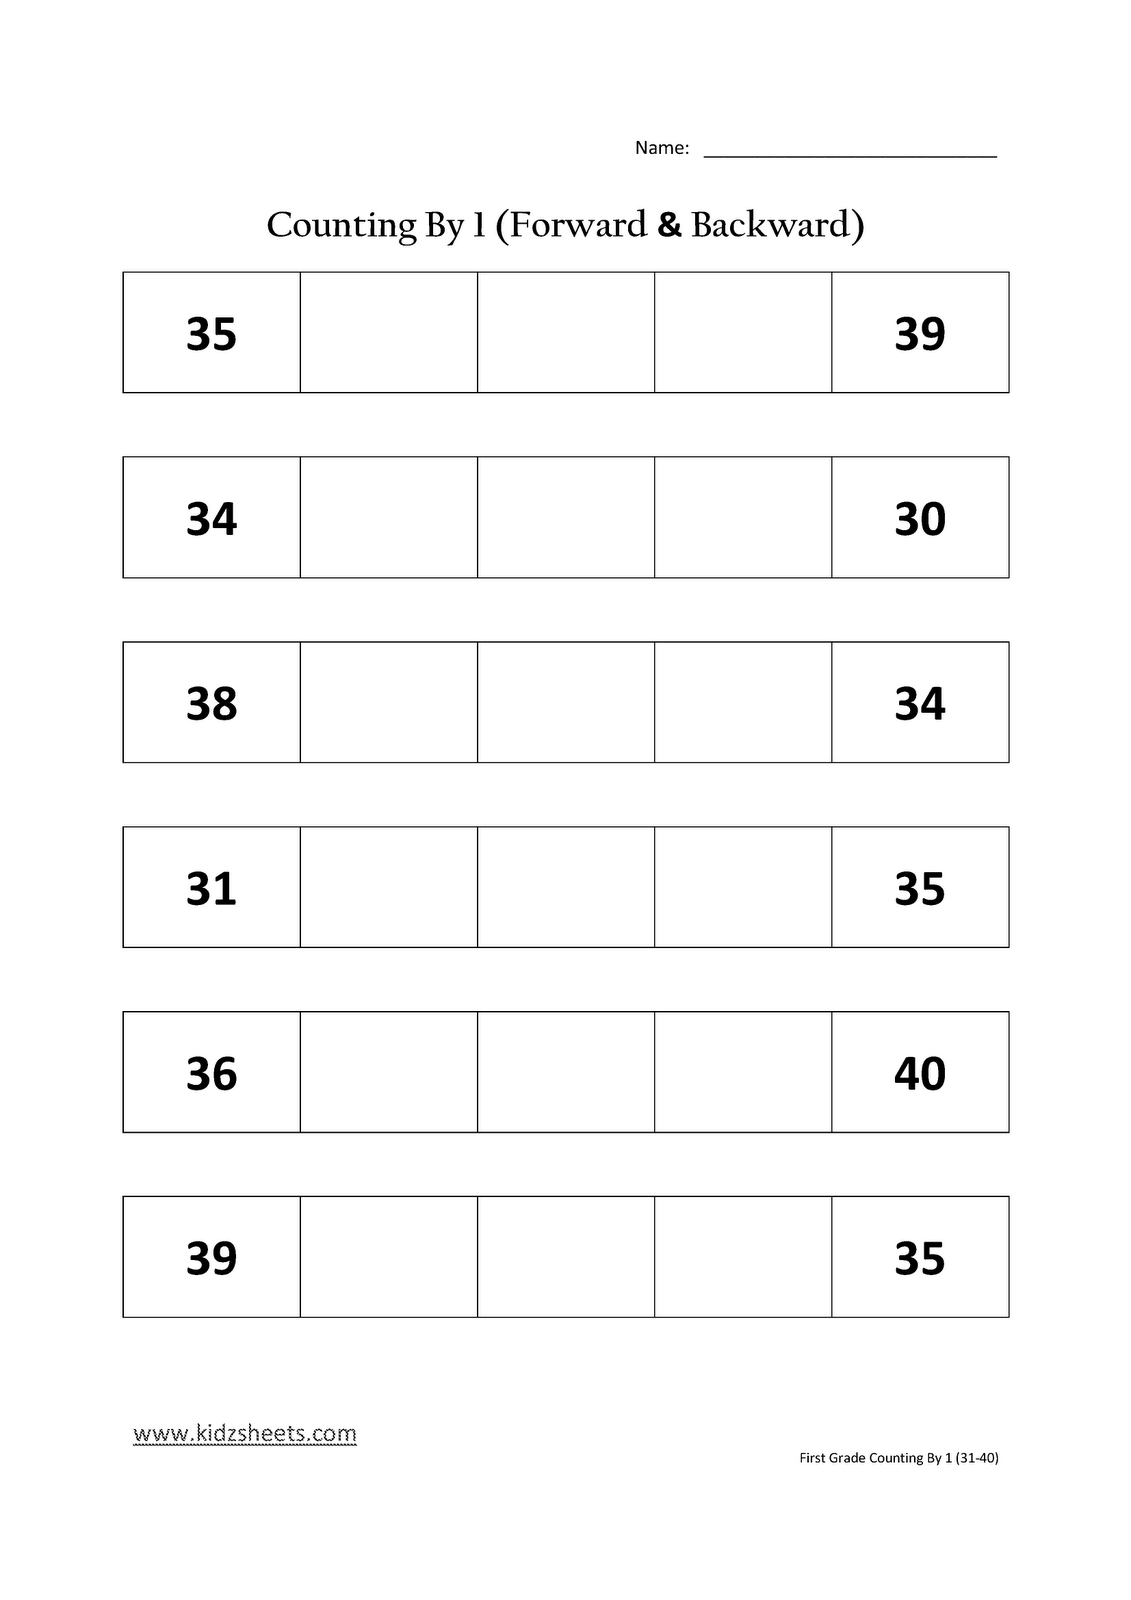 14 Best Images Of Kindergarten Counting Worksheets 11 20